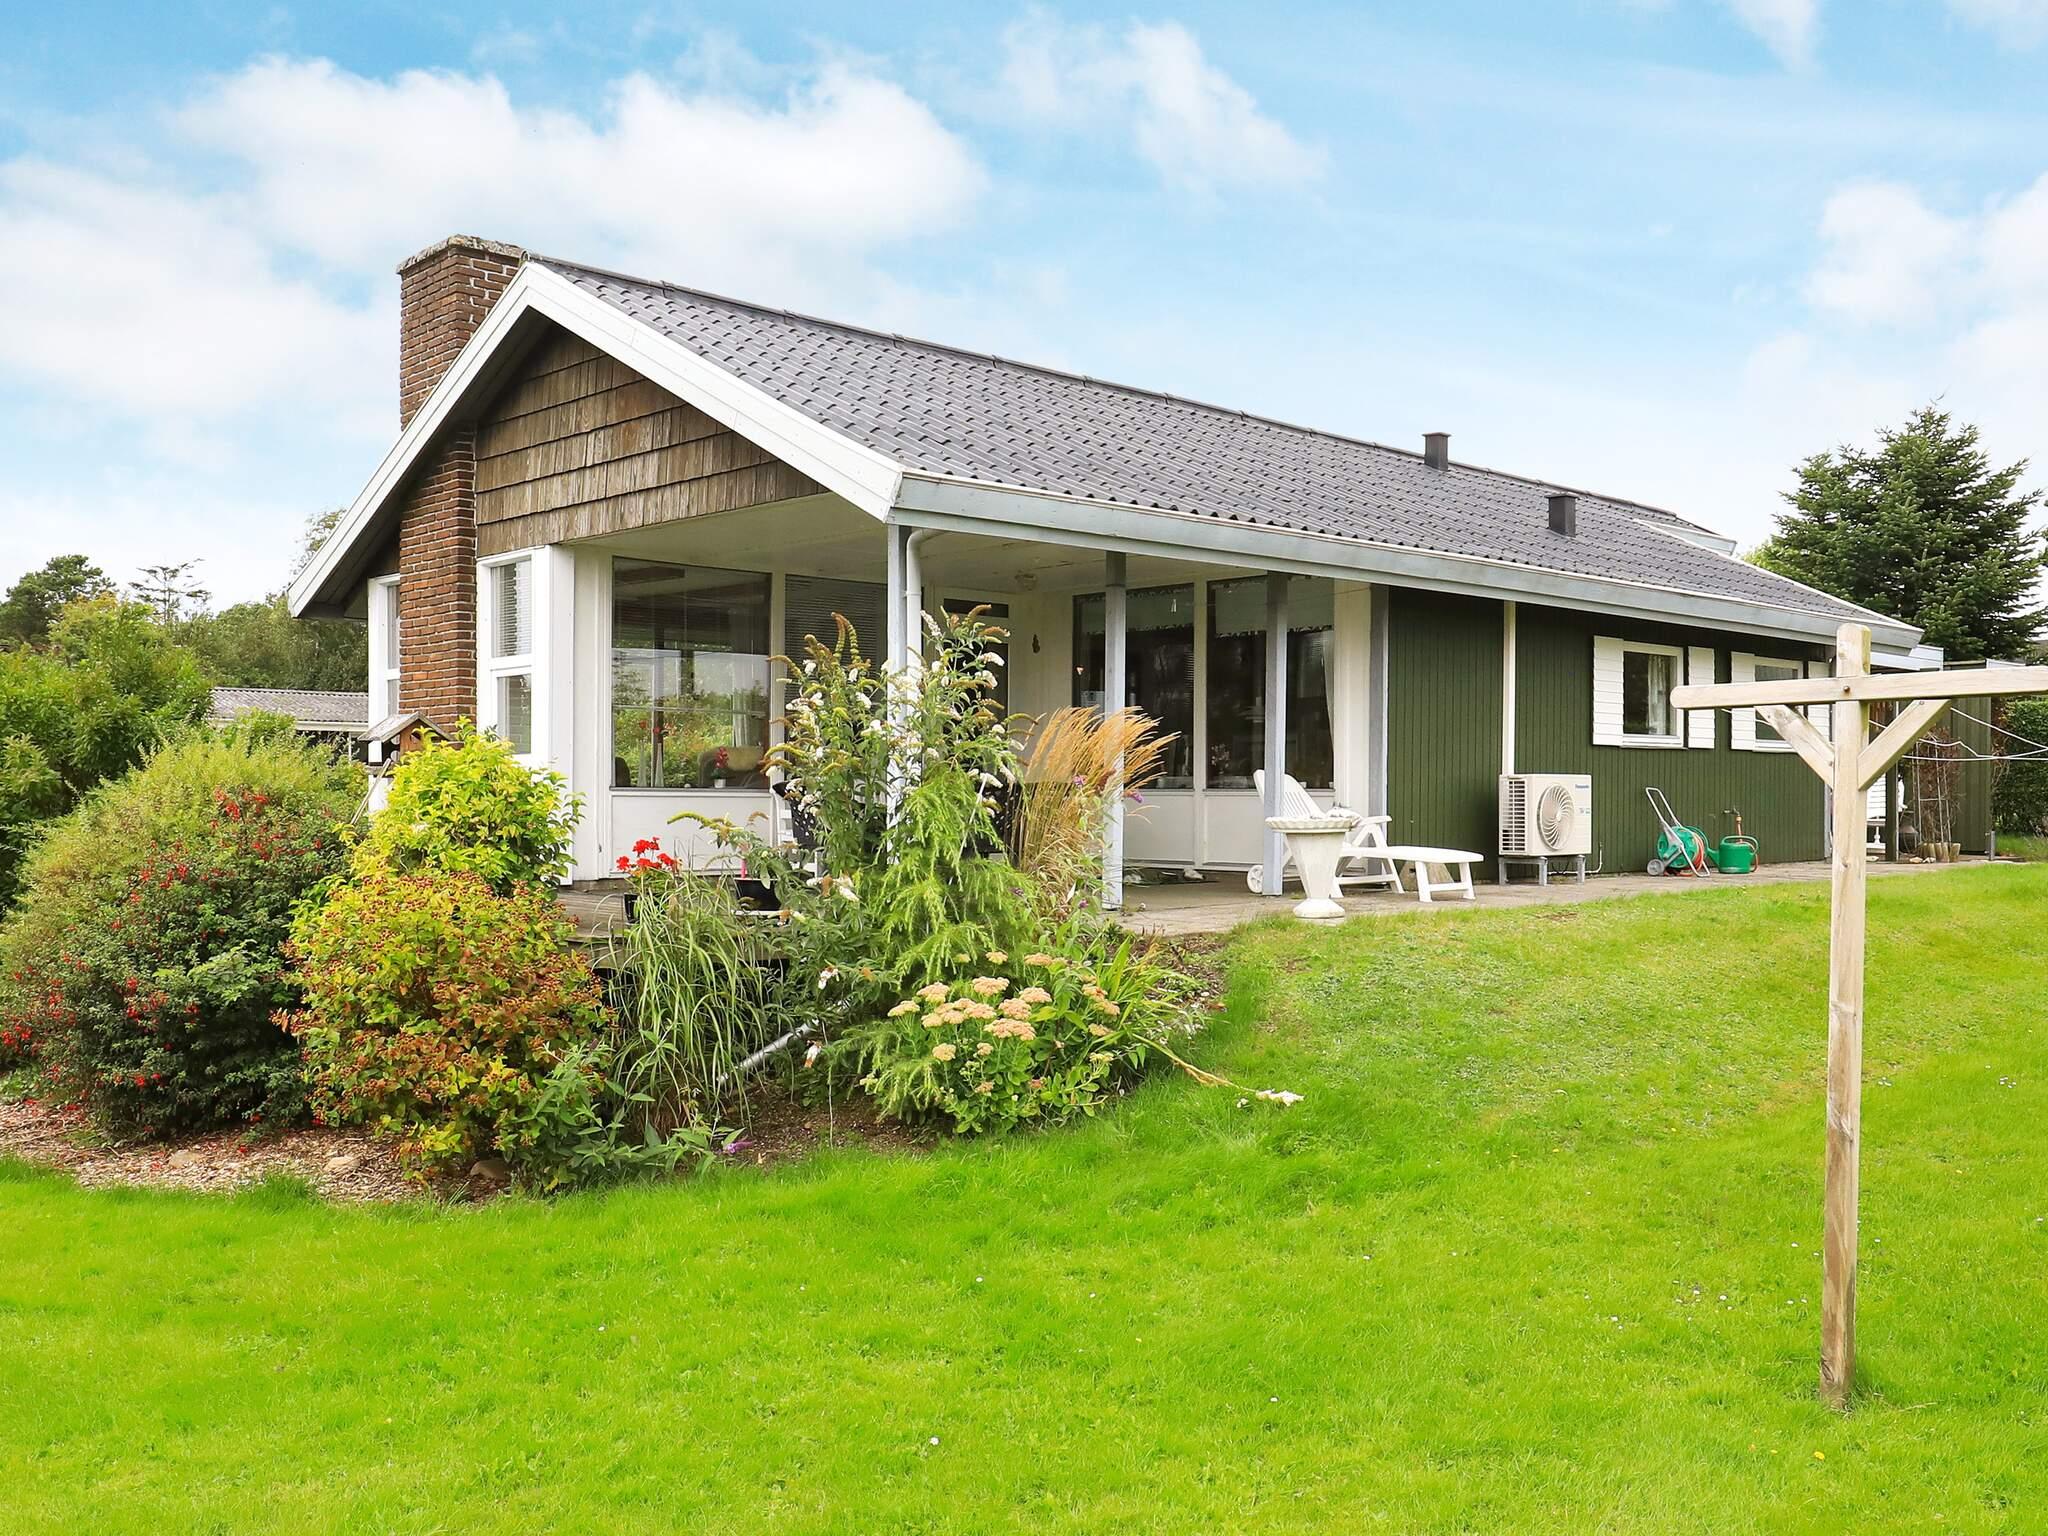 Maison de vacances Eskov Strandpark (610274), Roslev, , Limfjord, Danemark, image 1